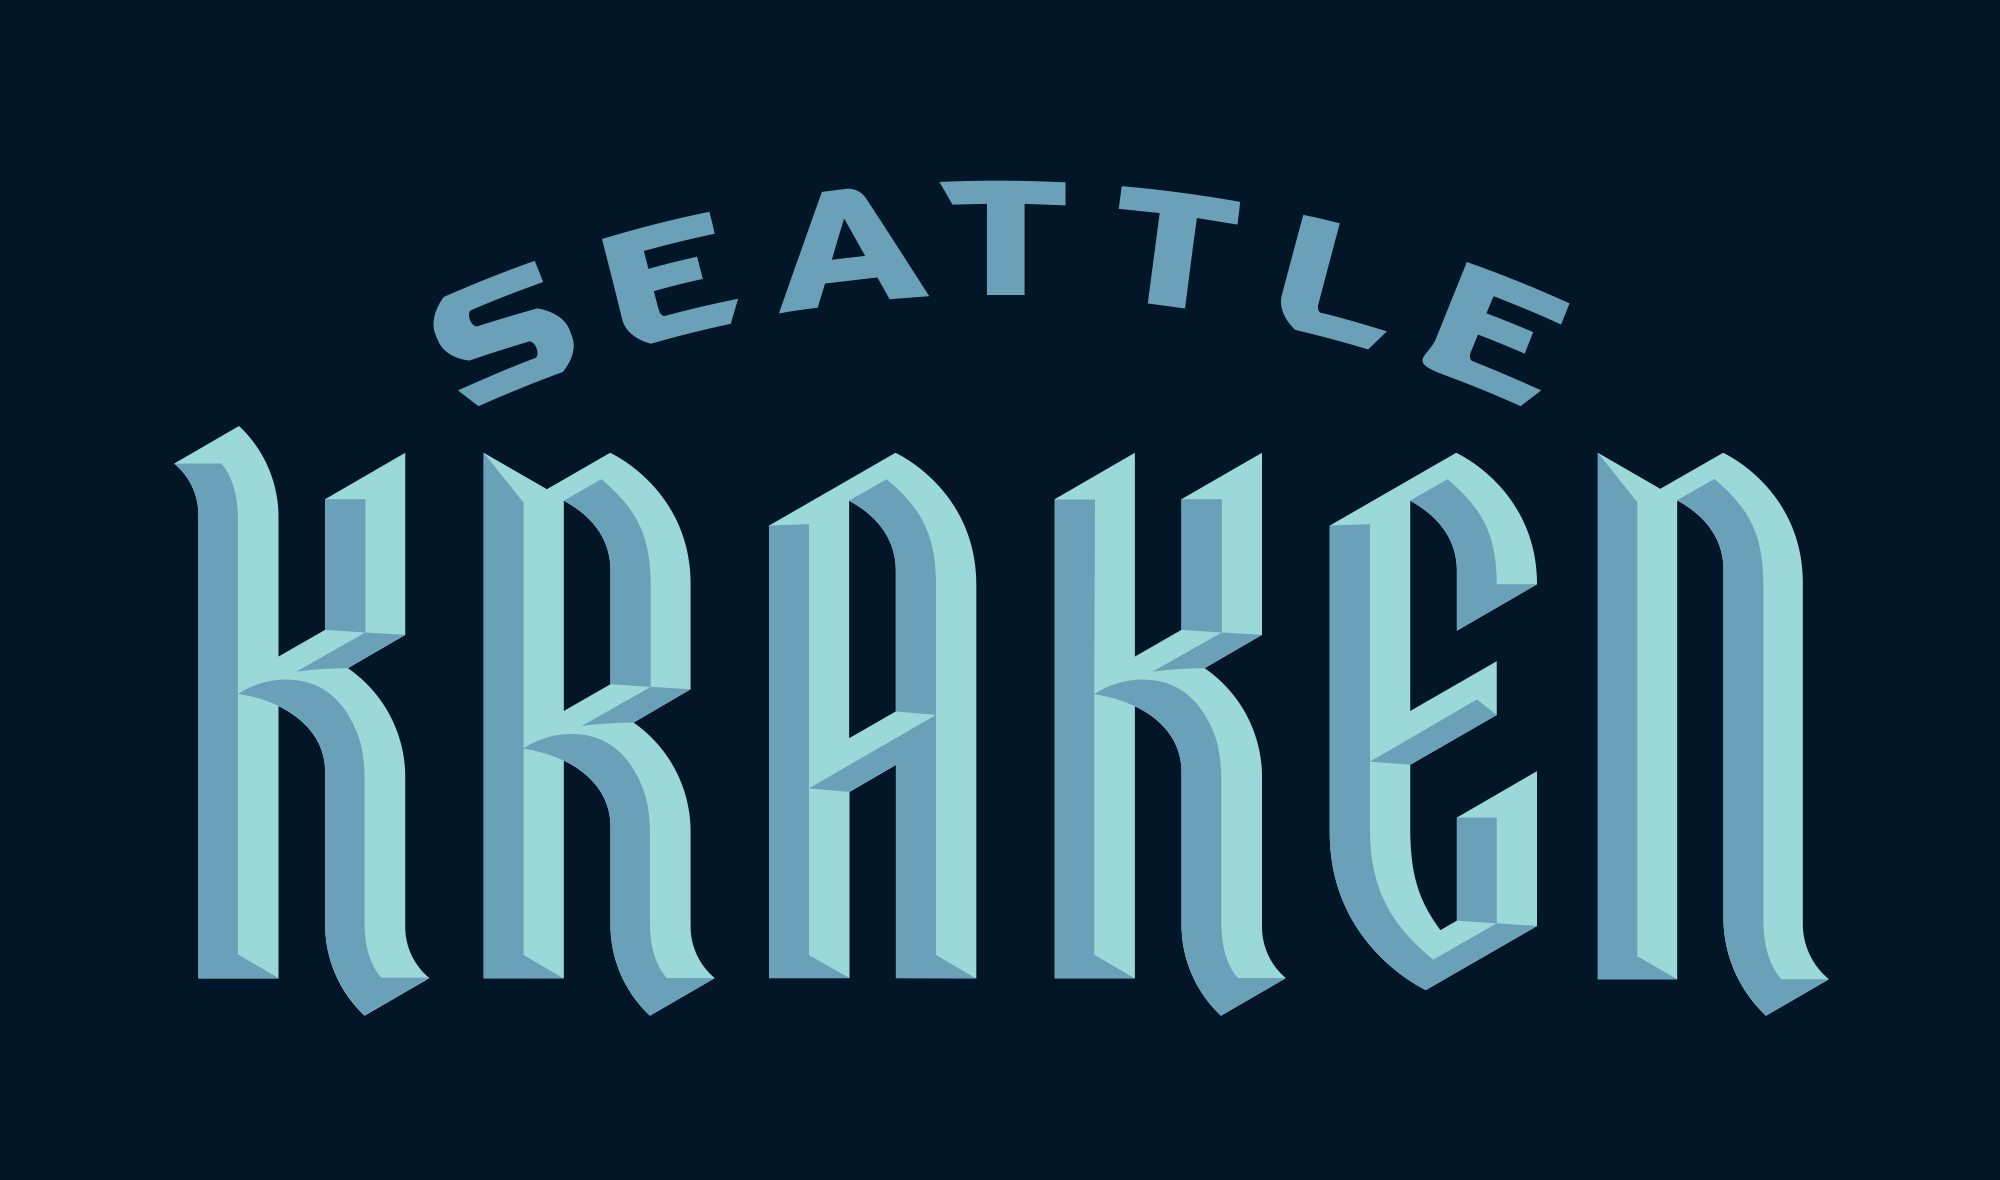 Brand New New Name And Logo For Seattle Kraken In 2020 New Names Identity Logo Gomez Palacio